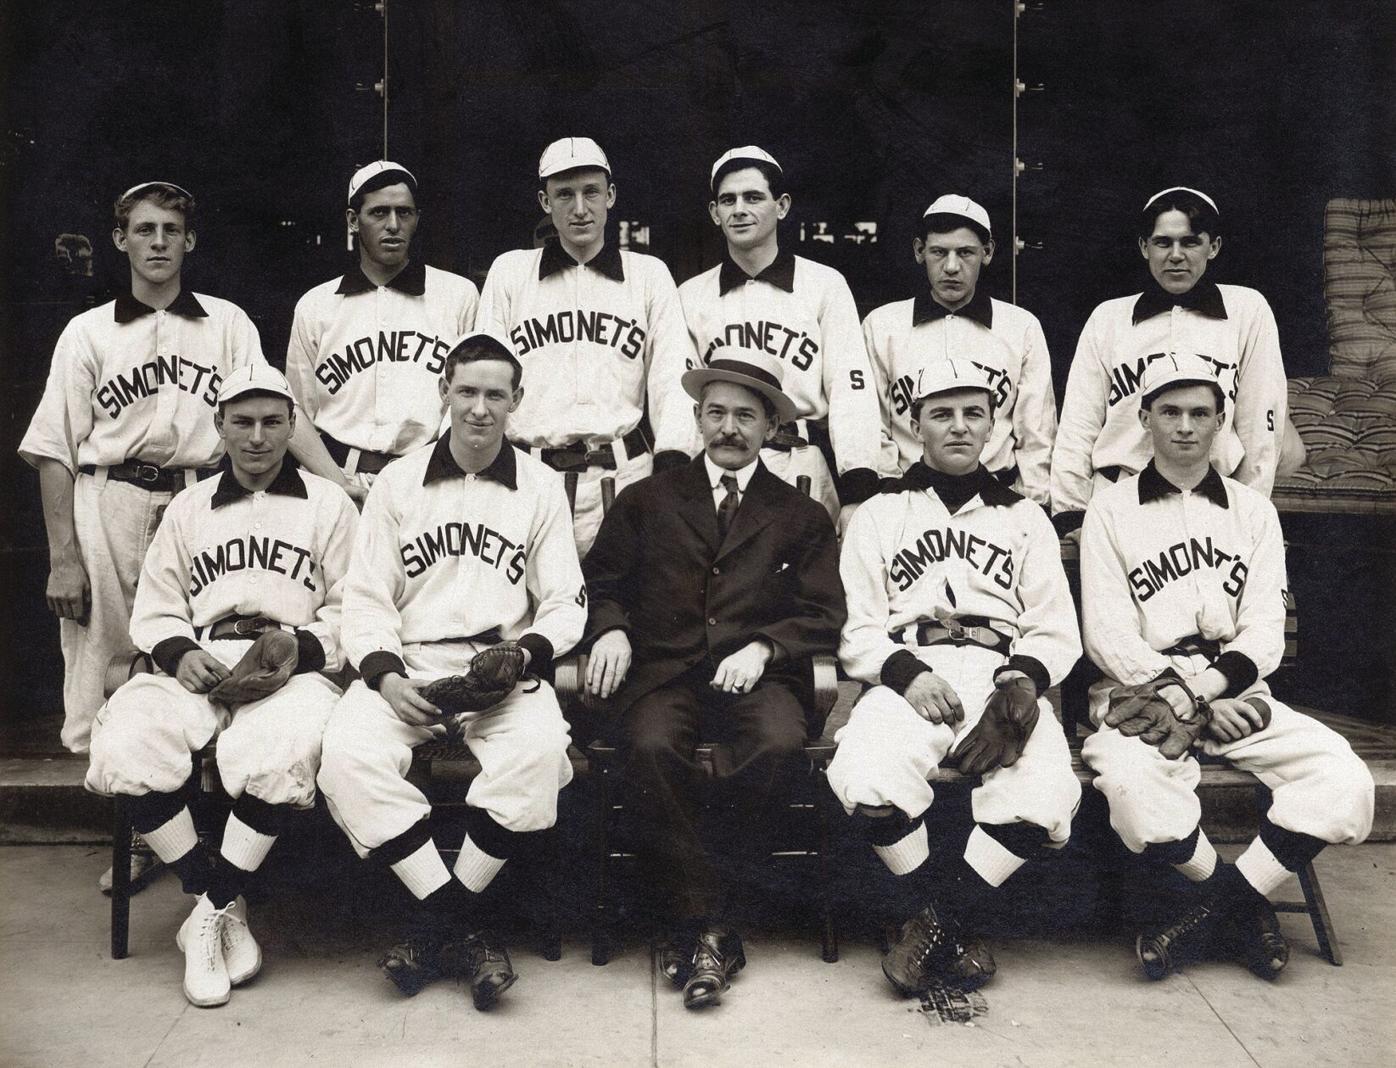 Simonet Baseball Club.jpg